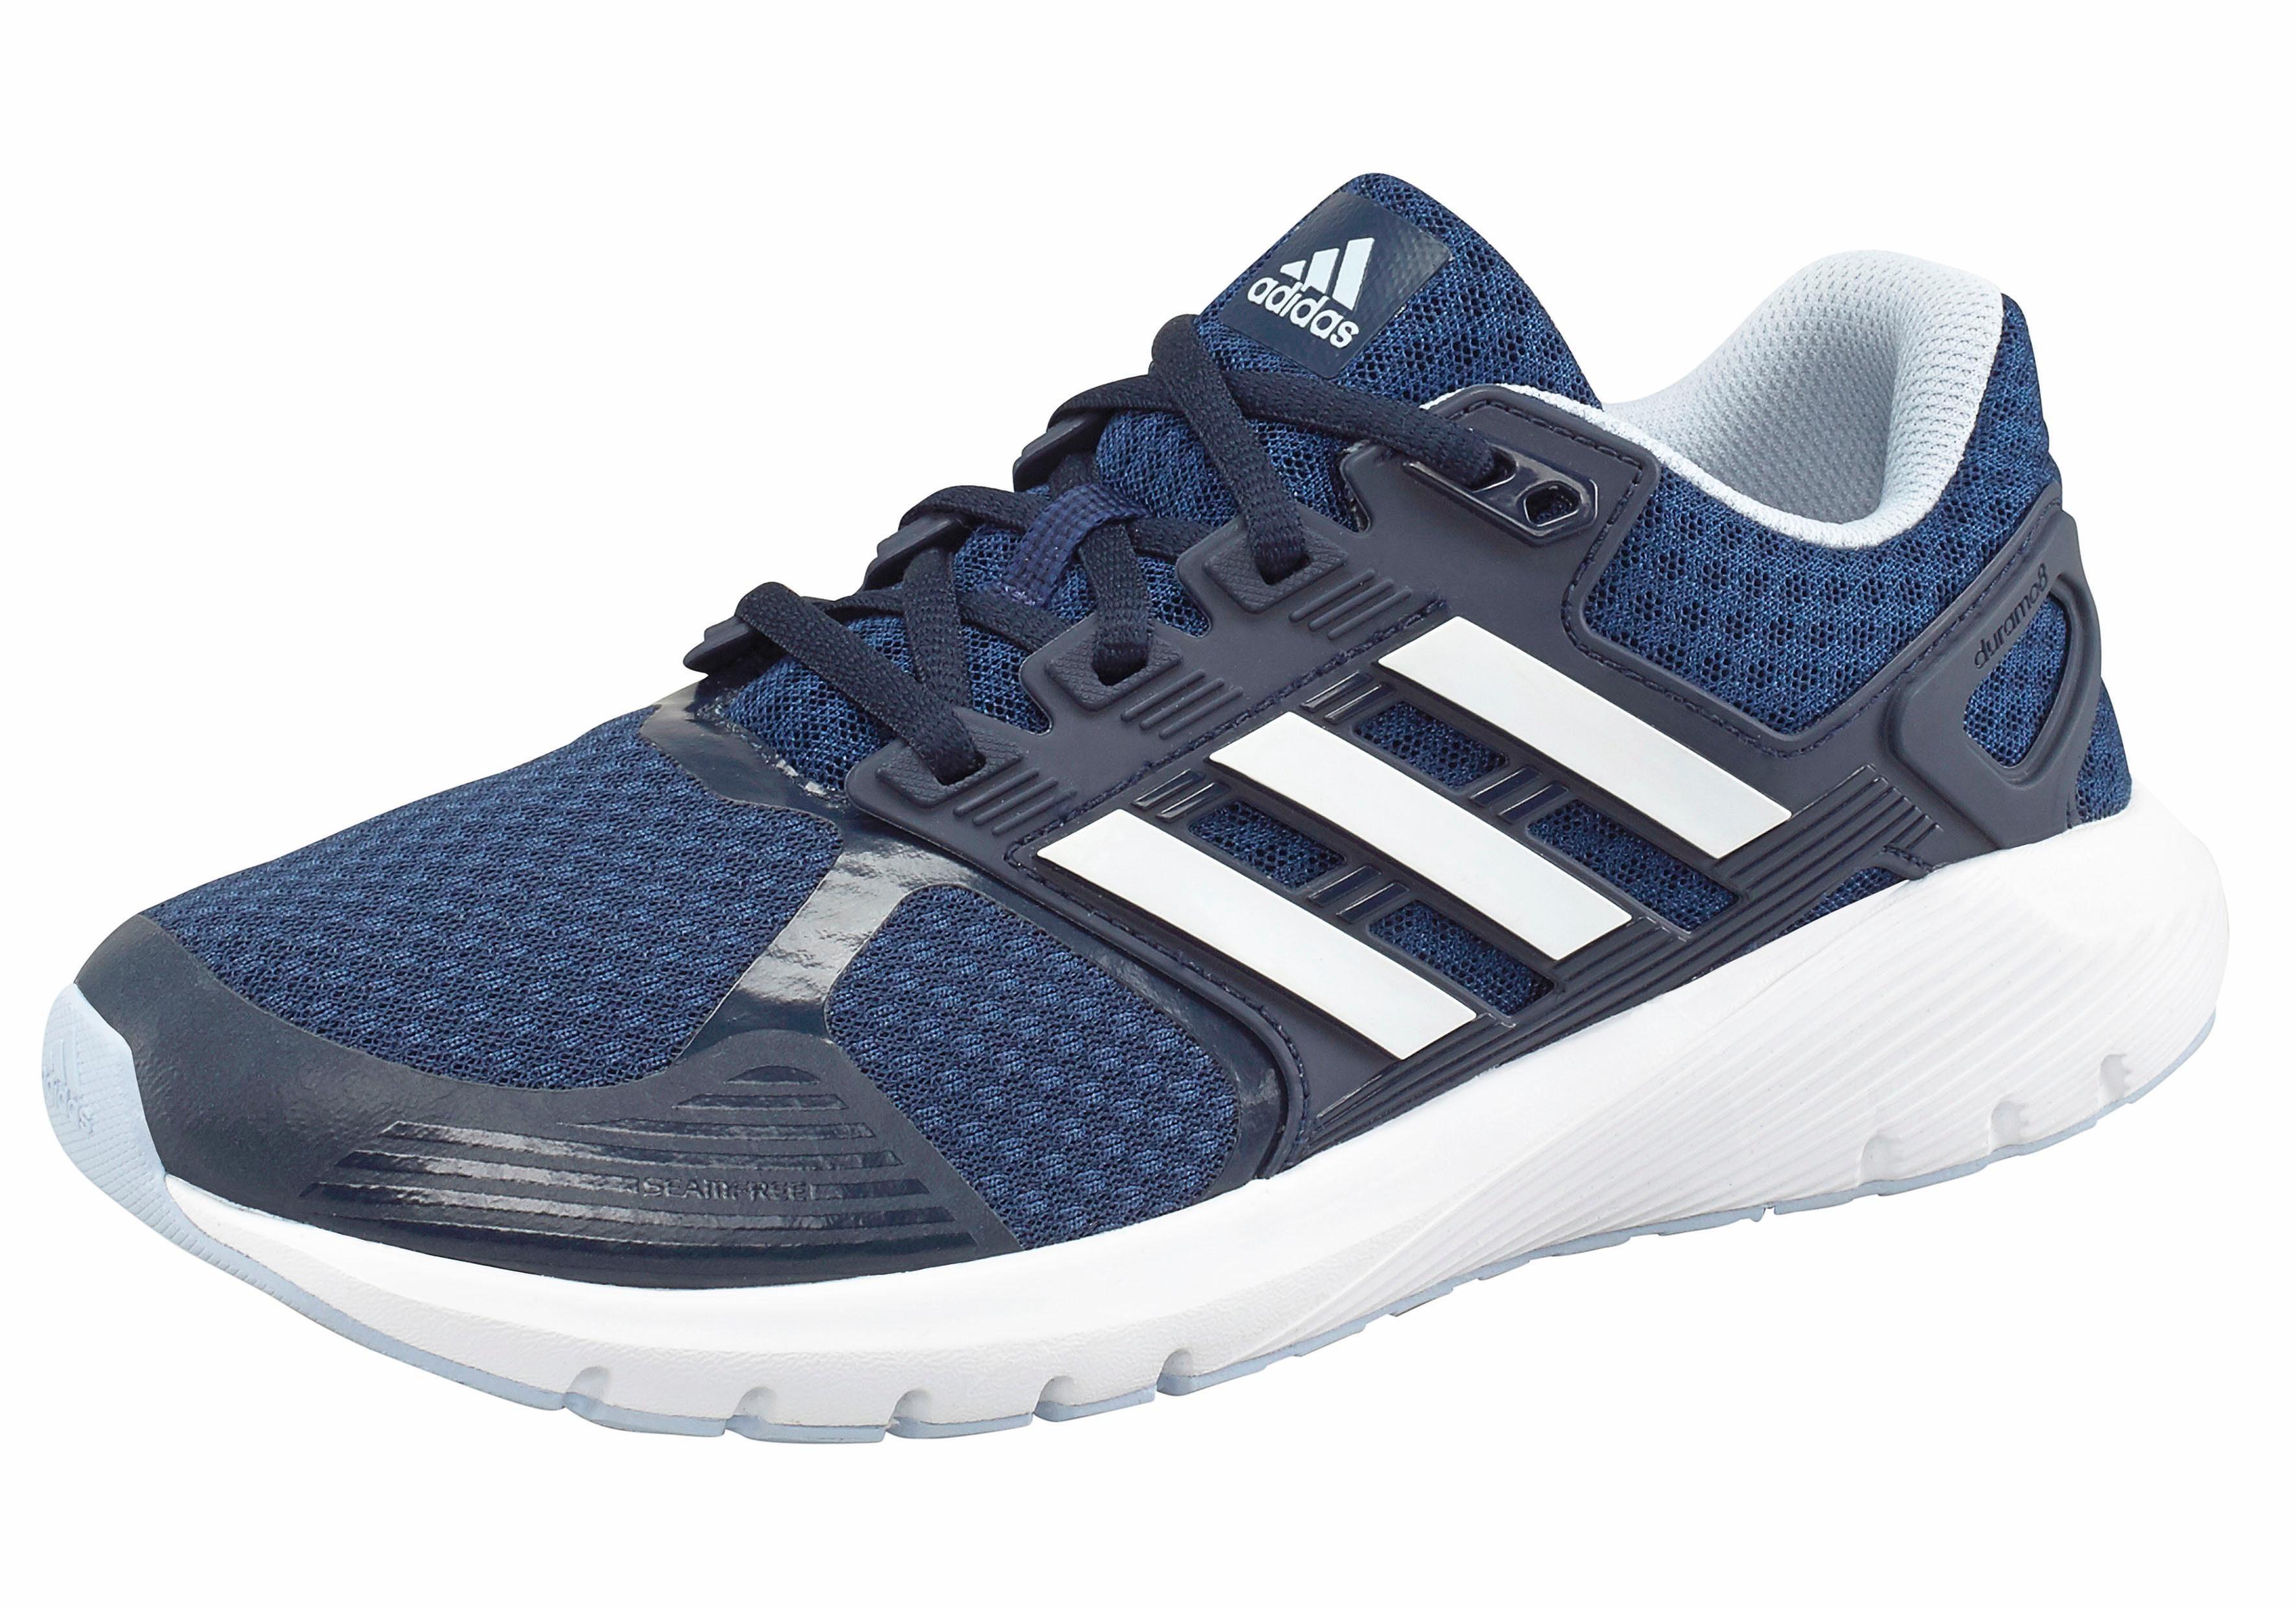 adidas Performance Duramo 8 W Laufschuh kaufen  blau-weiß